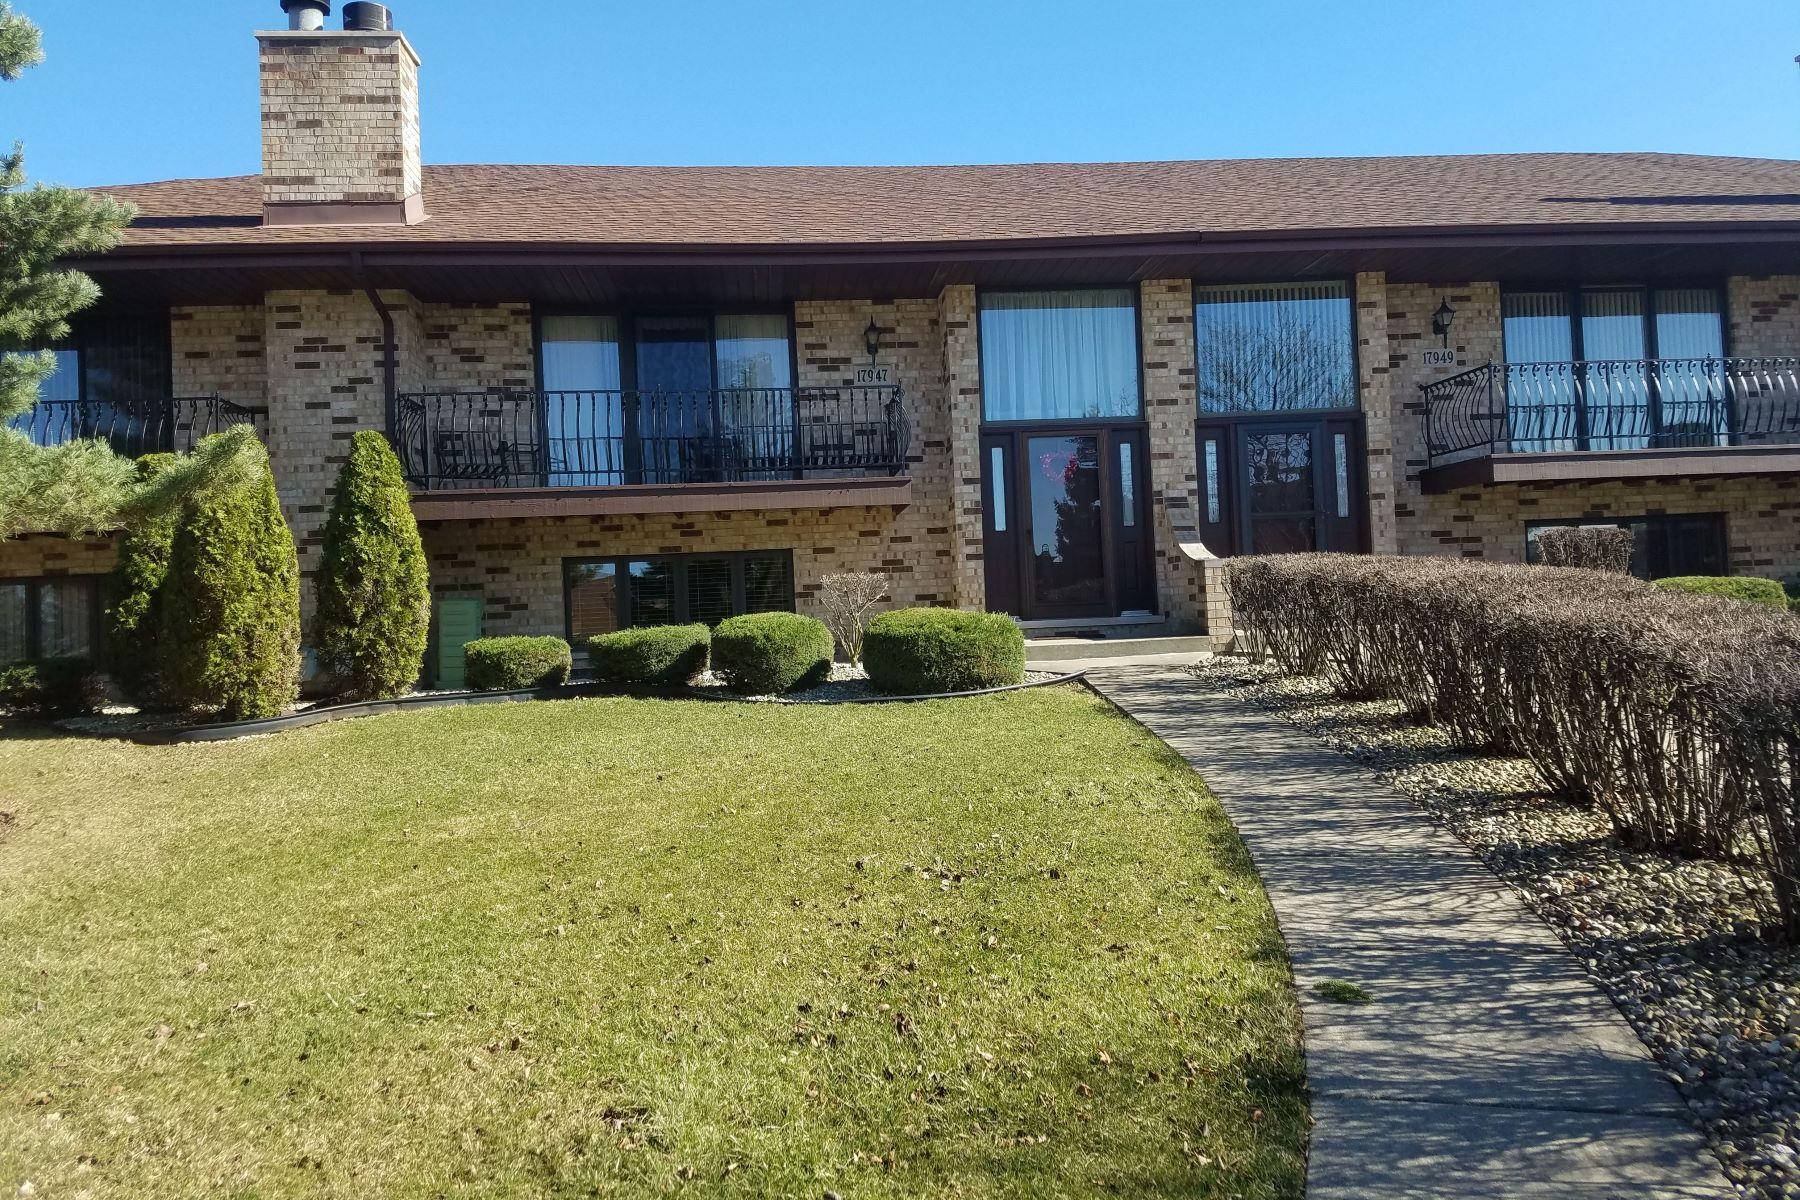 独户住宅 为 销售 在 17947 Andrea Drive 17947 Andrea Drive 奥兰帕克, 伊利诺斯州 60462 美国